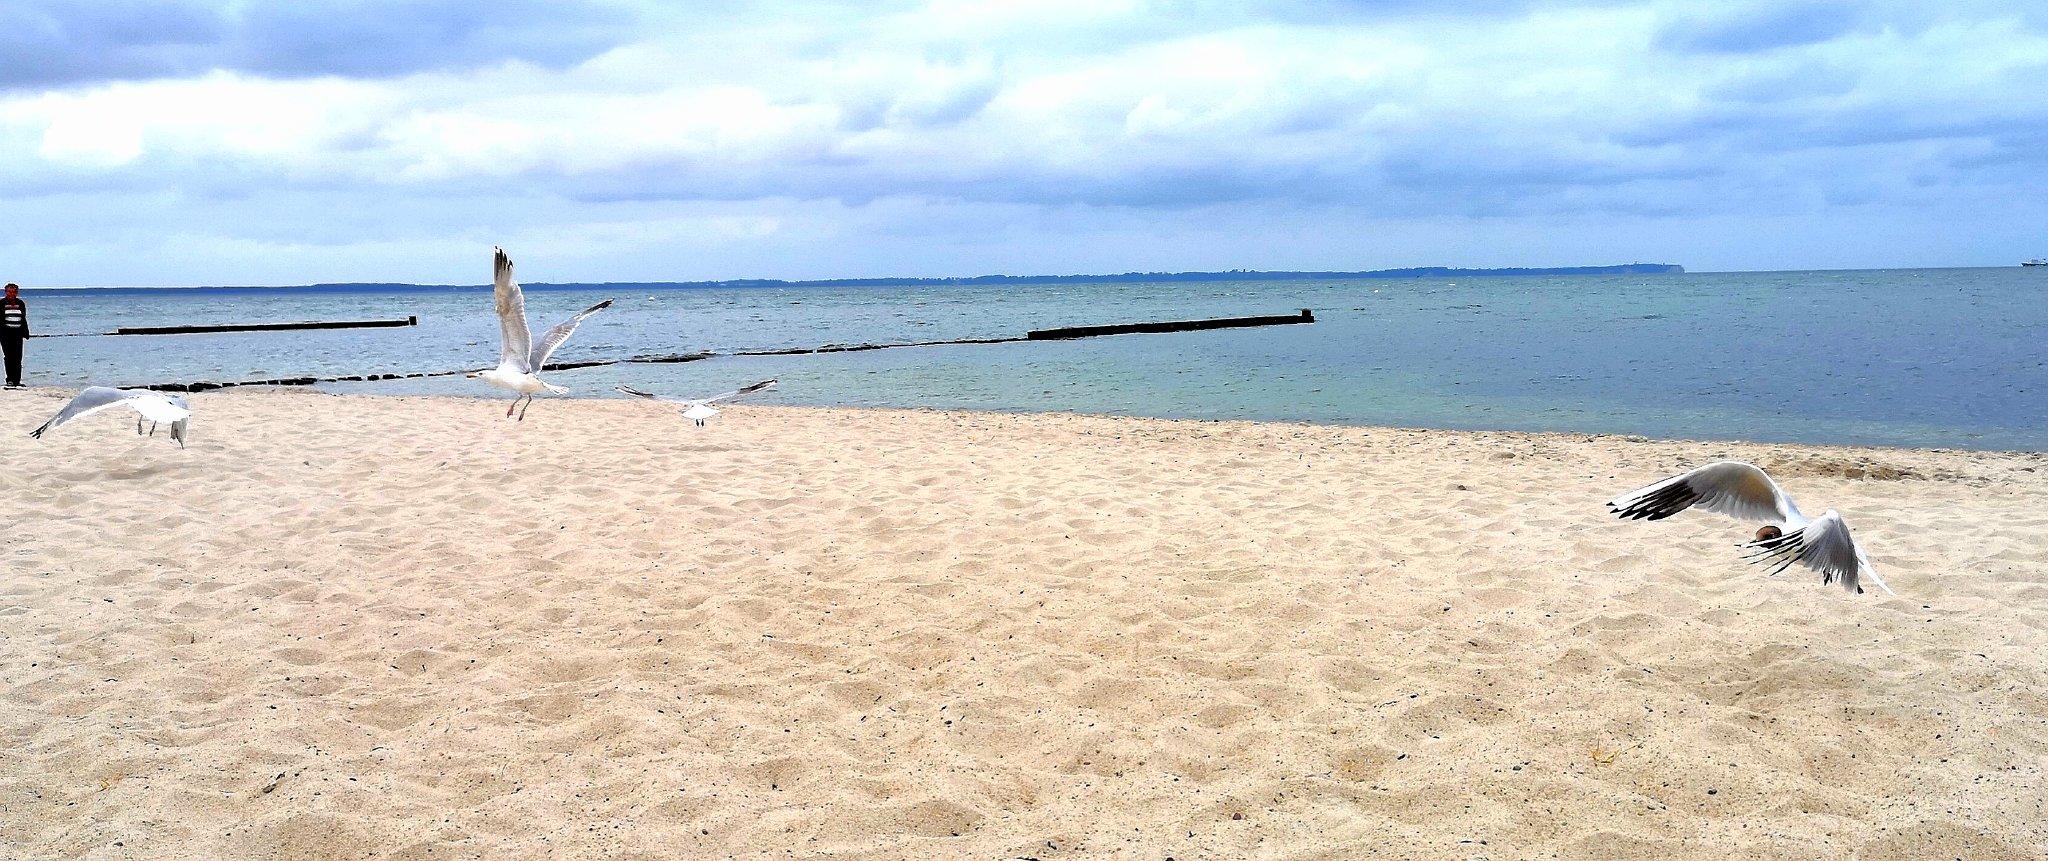 SELLIN - naheliegender Ostseestrand